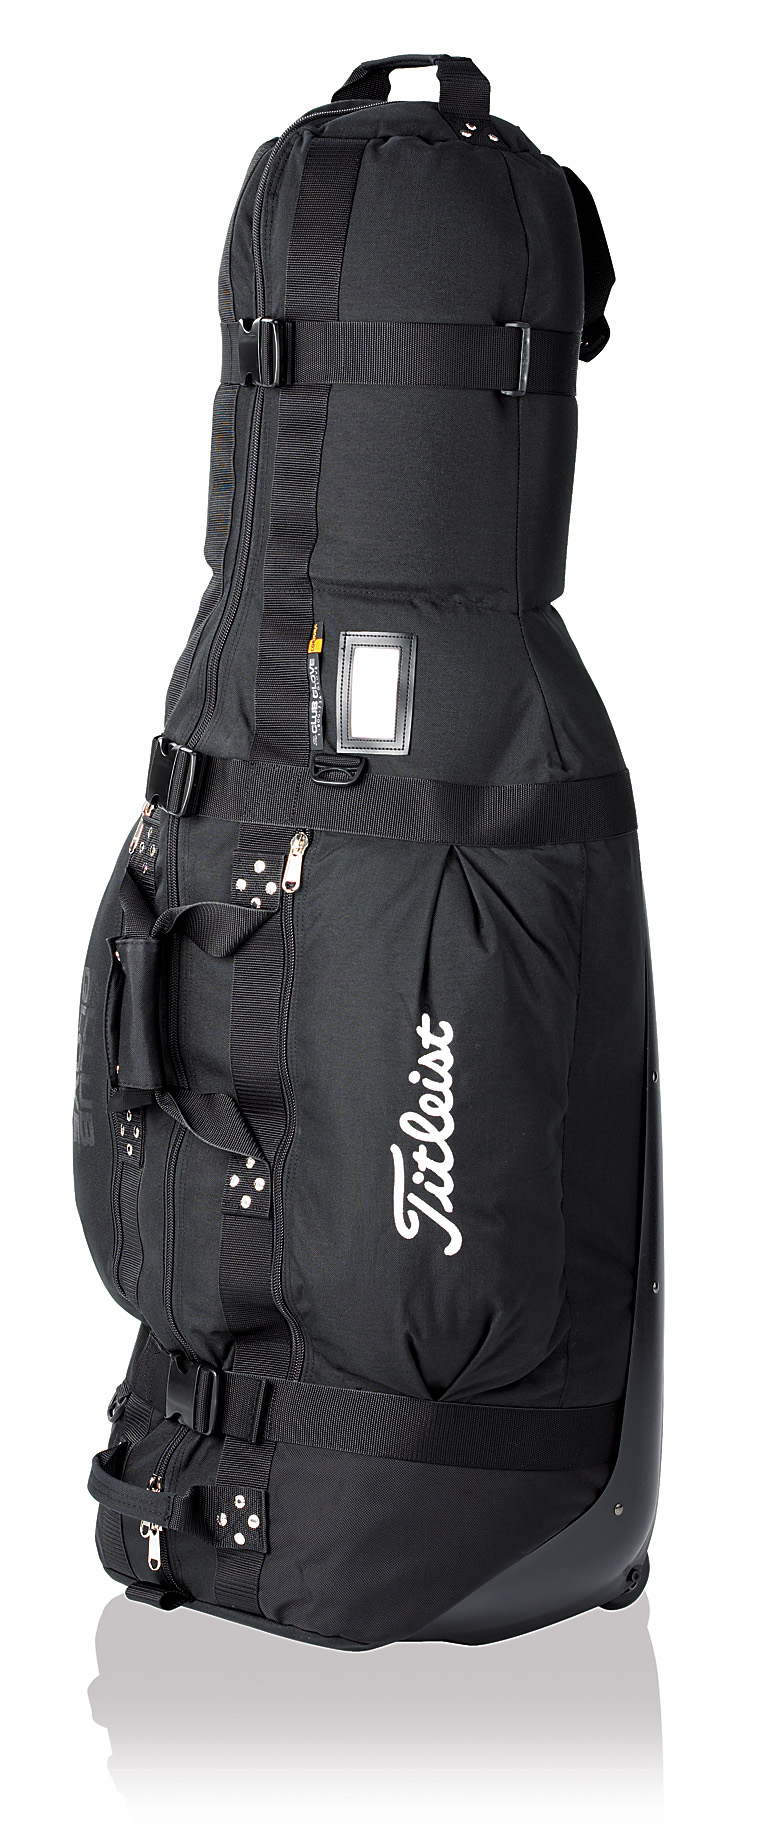 club glove golf travel bag